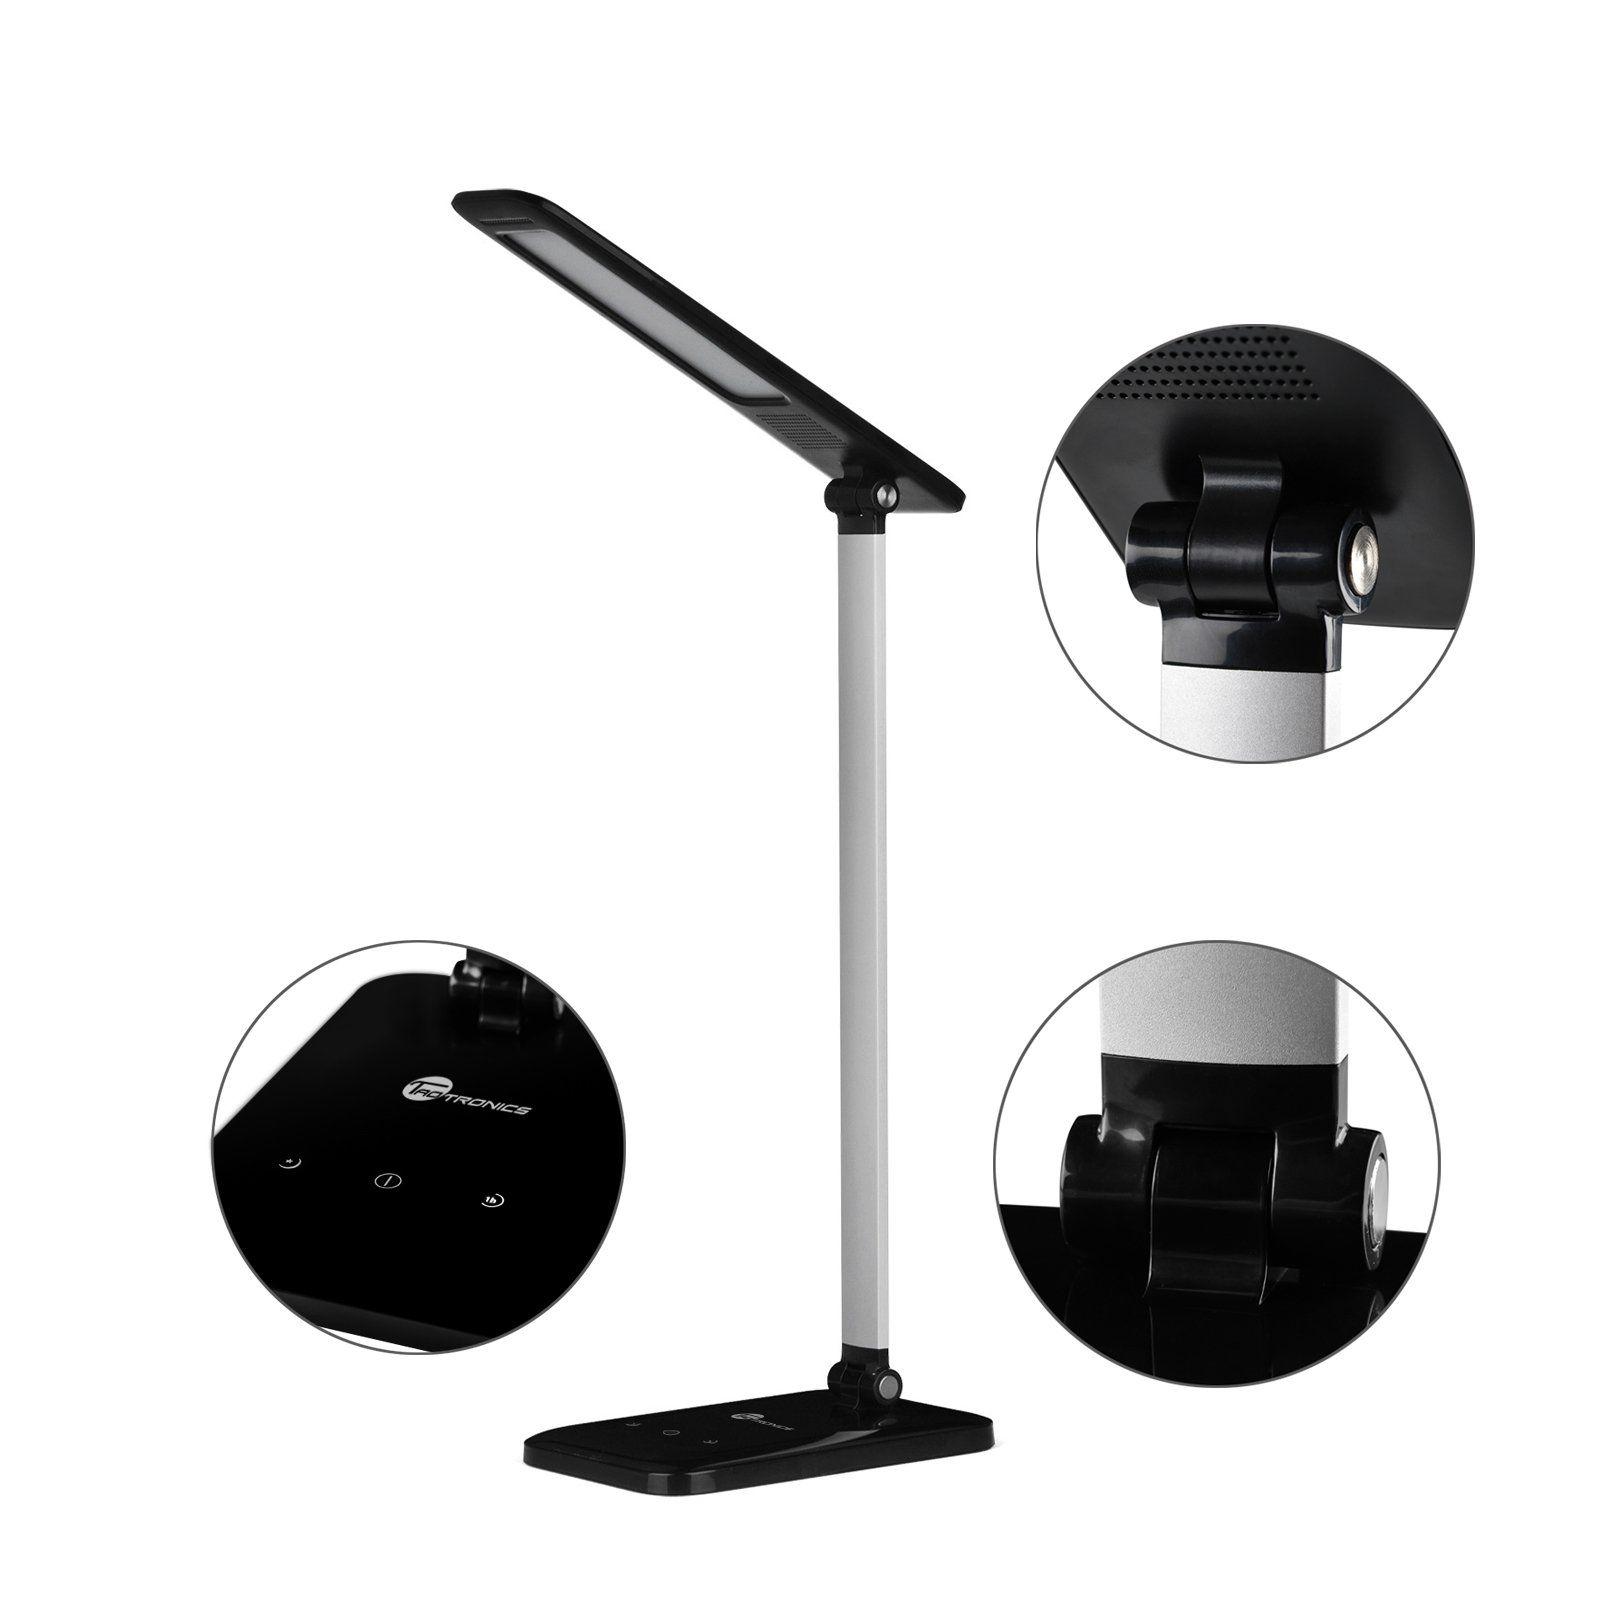 Cool Reading Light taotronics led desk lamp, dimmable led table lamp, cool white